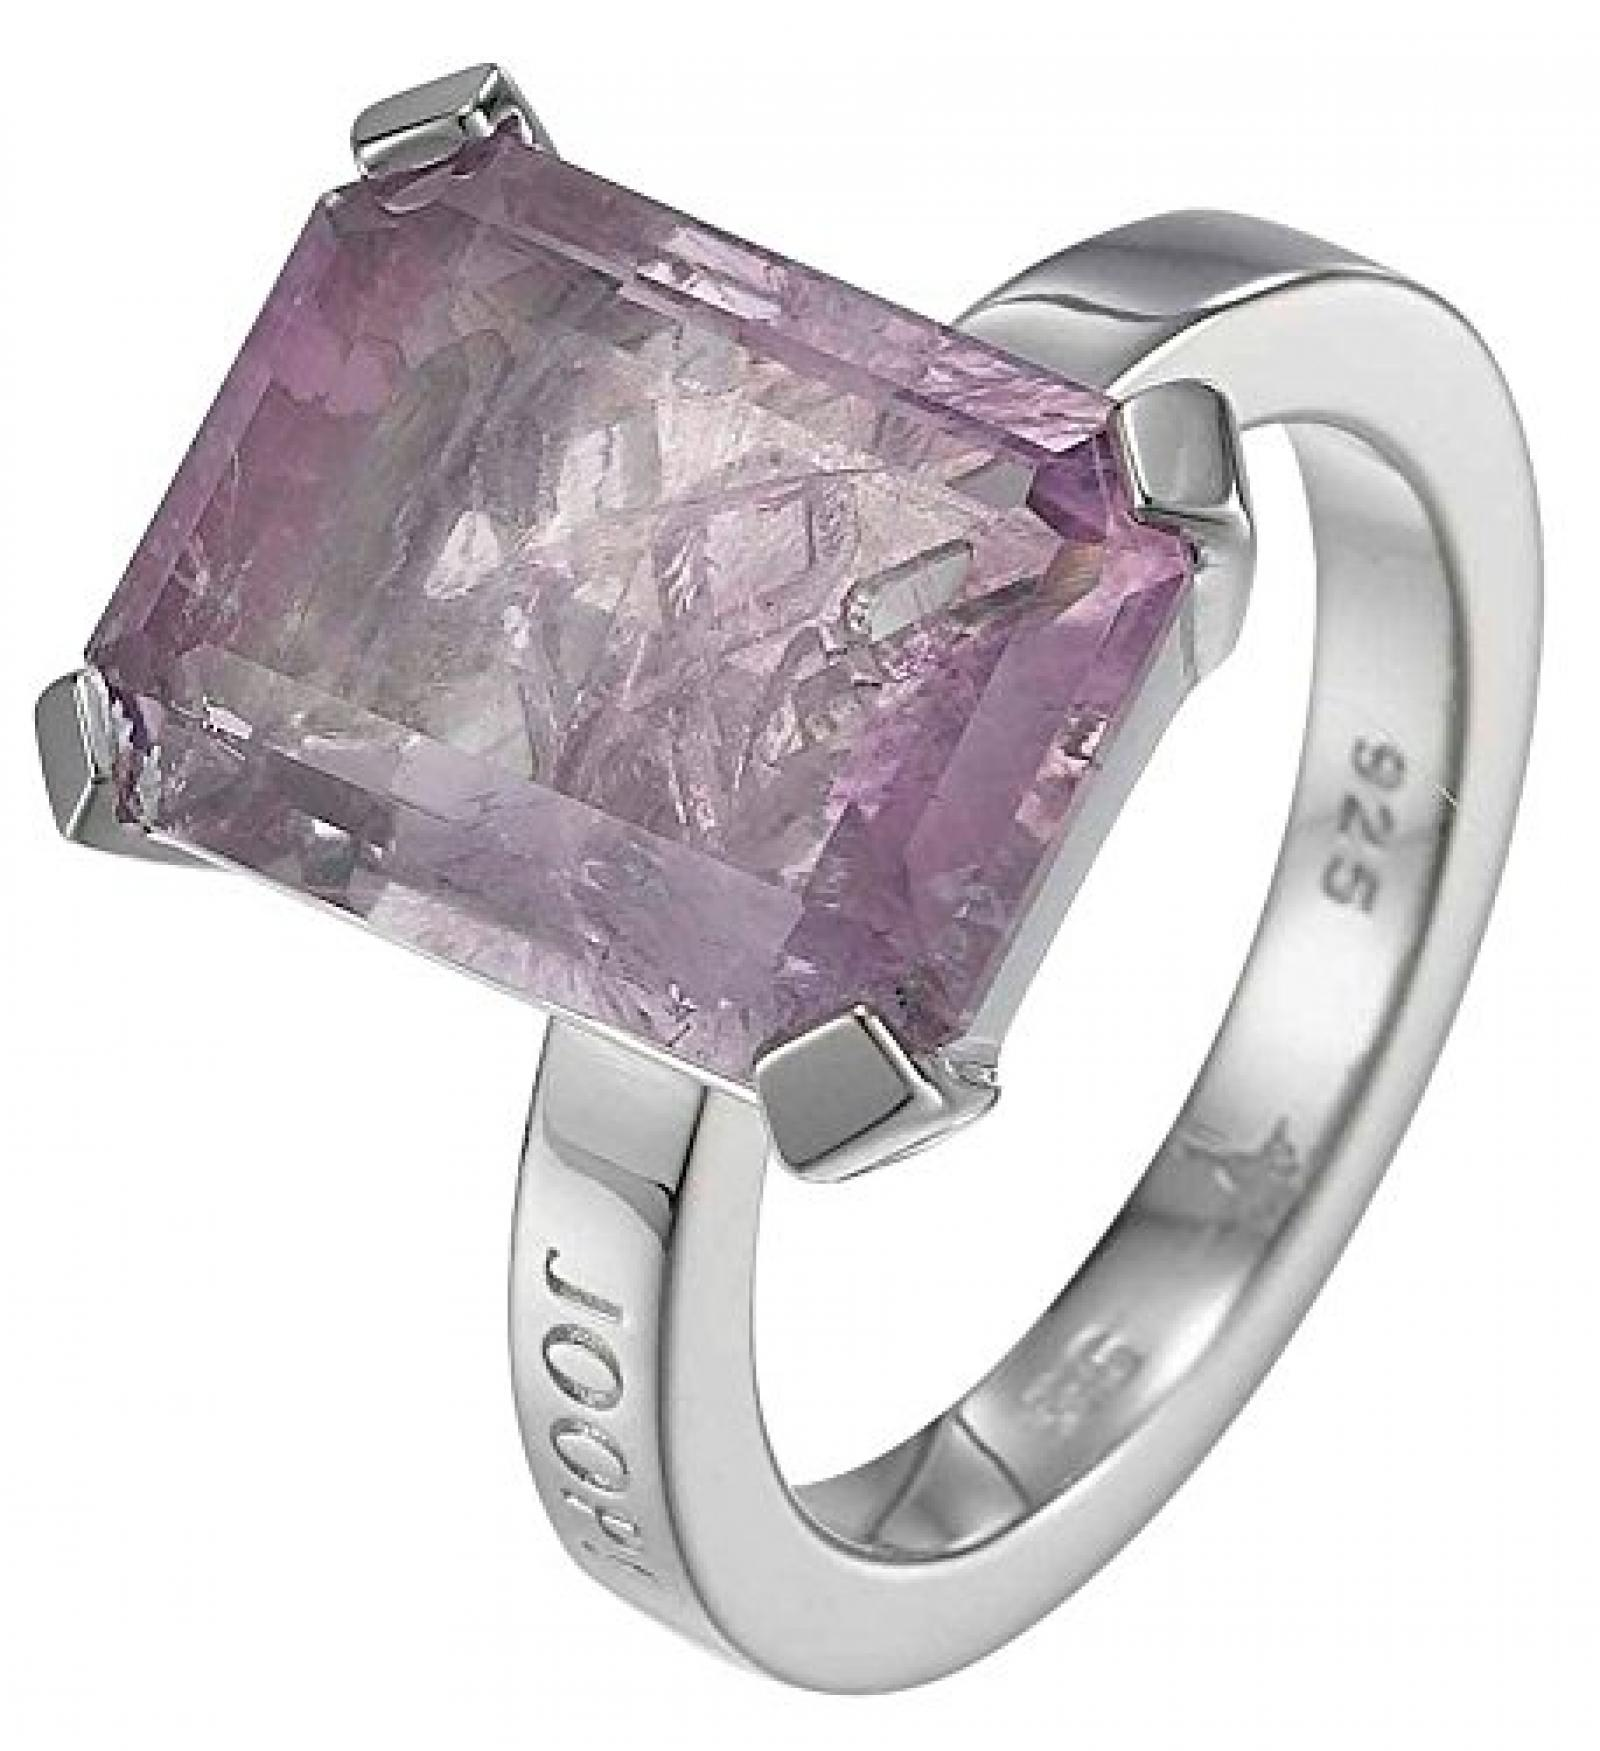 Joop Damen-Ring 925 Sterling Silber rhodiniert Amethyst Mia pink JPRG90496B6